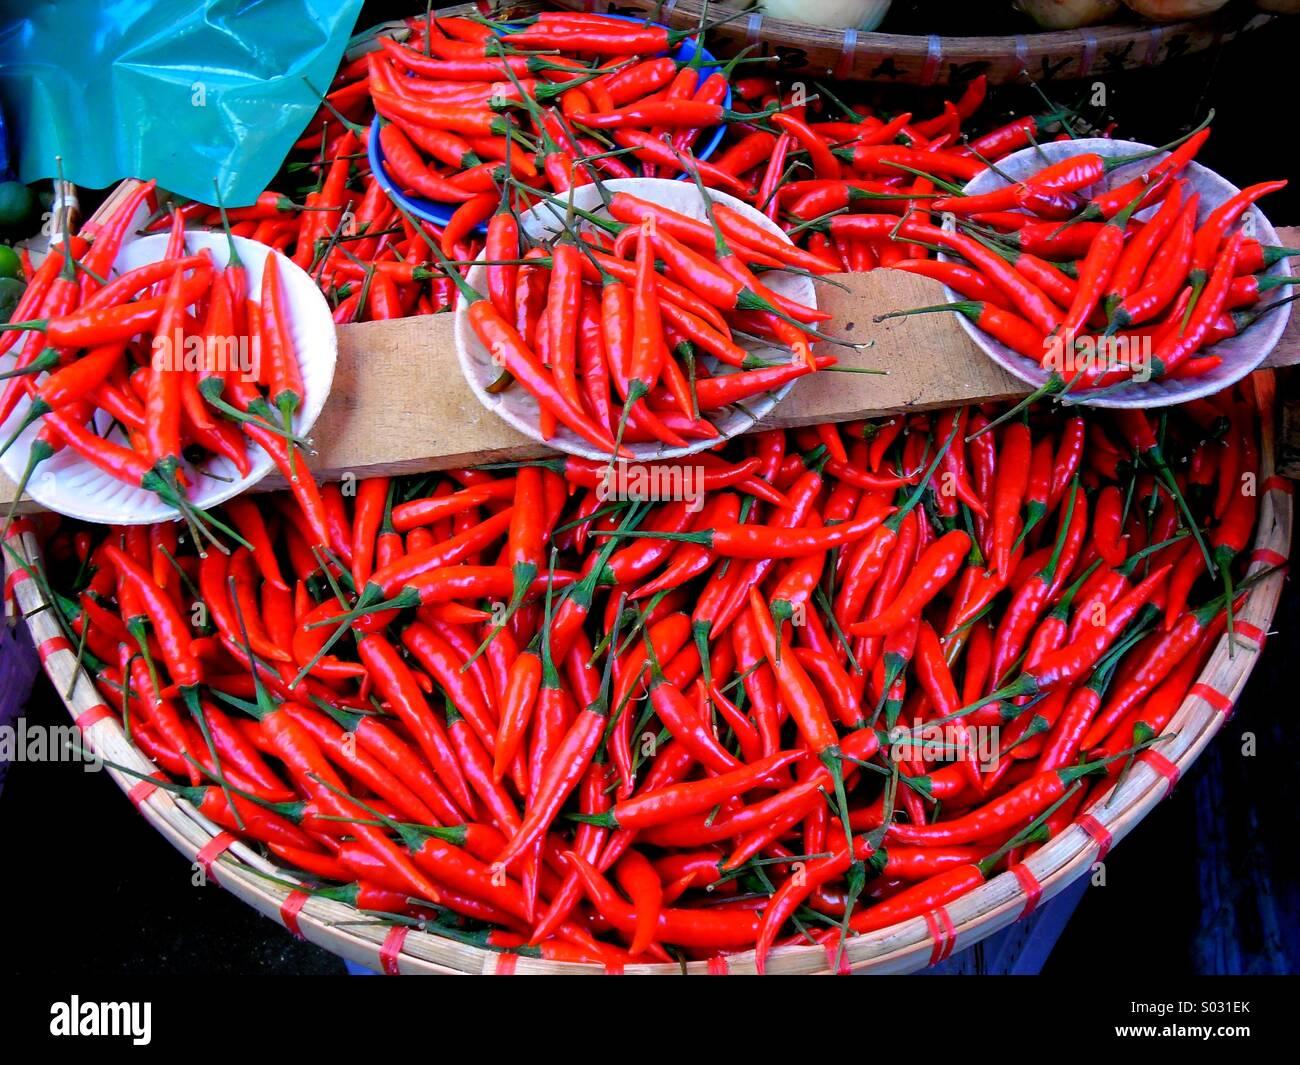 Rote Chilischote Stockfoto